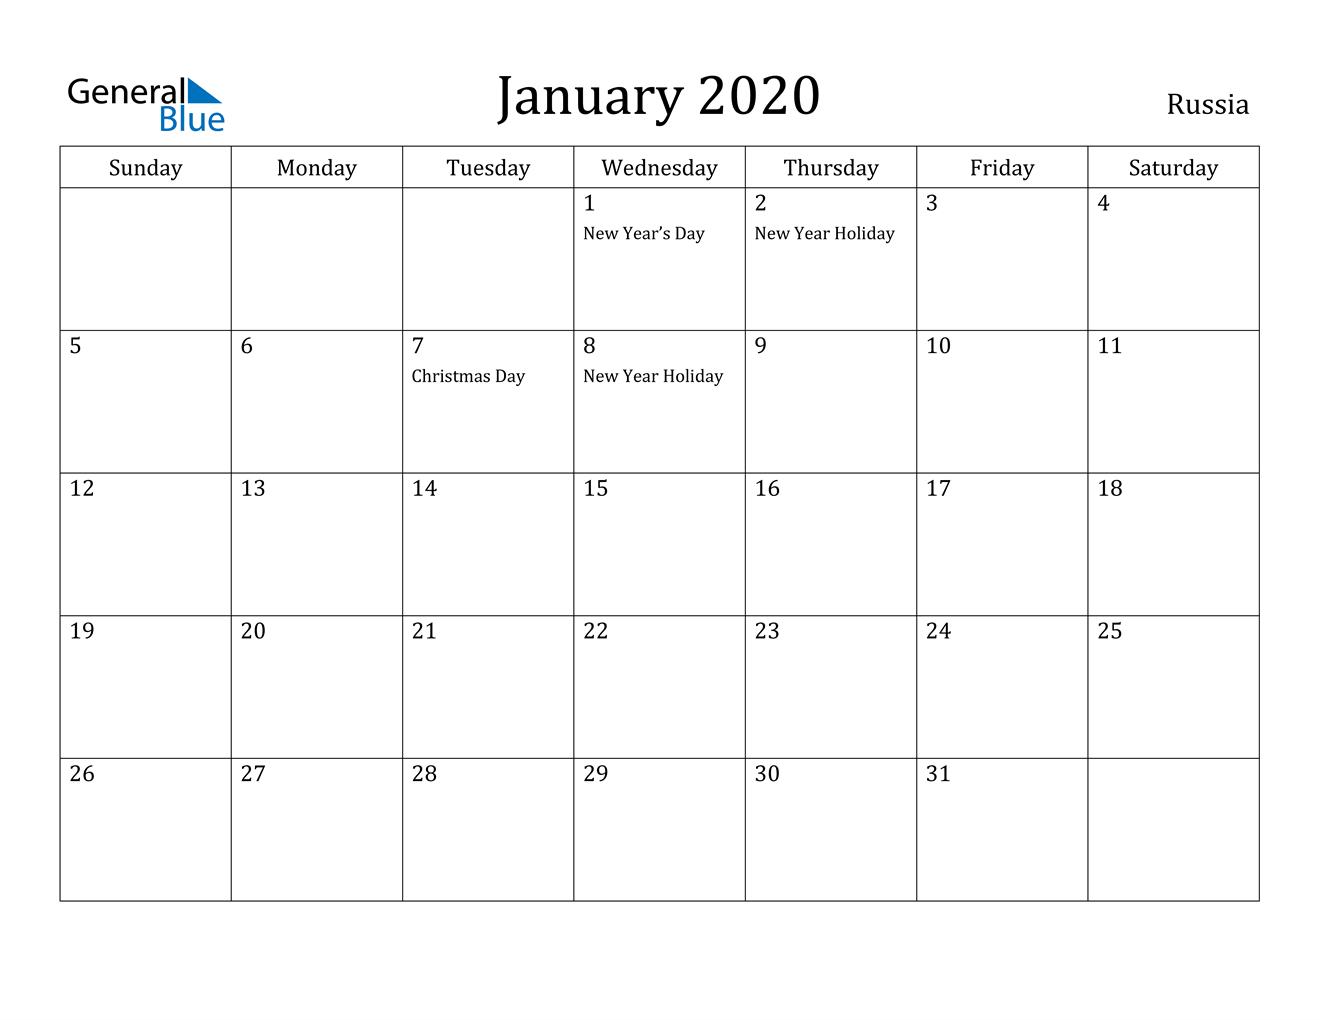 January 2020 Calendar - Russia